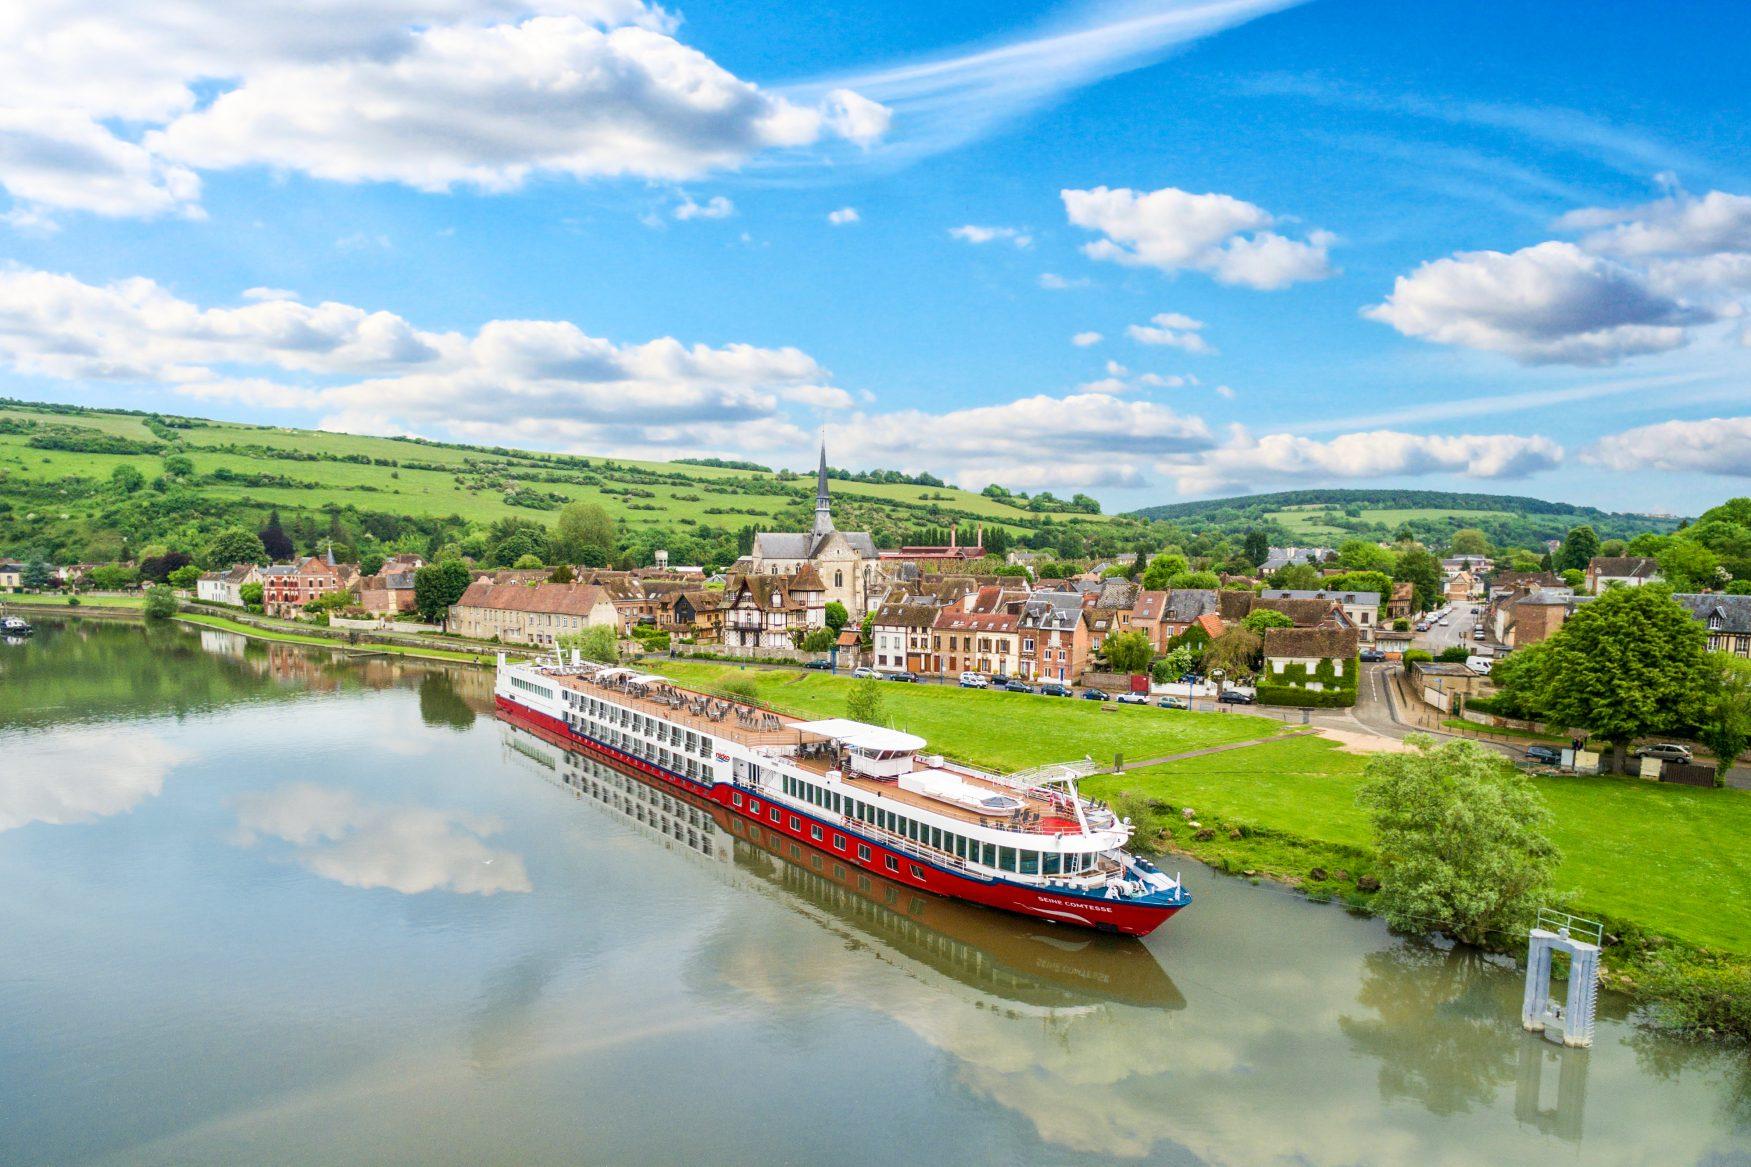 Die MS SEINE COMTESSE Foto: Nicko cruises